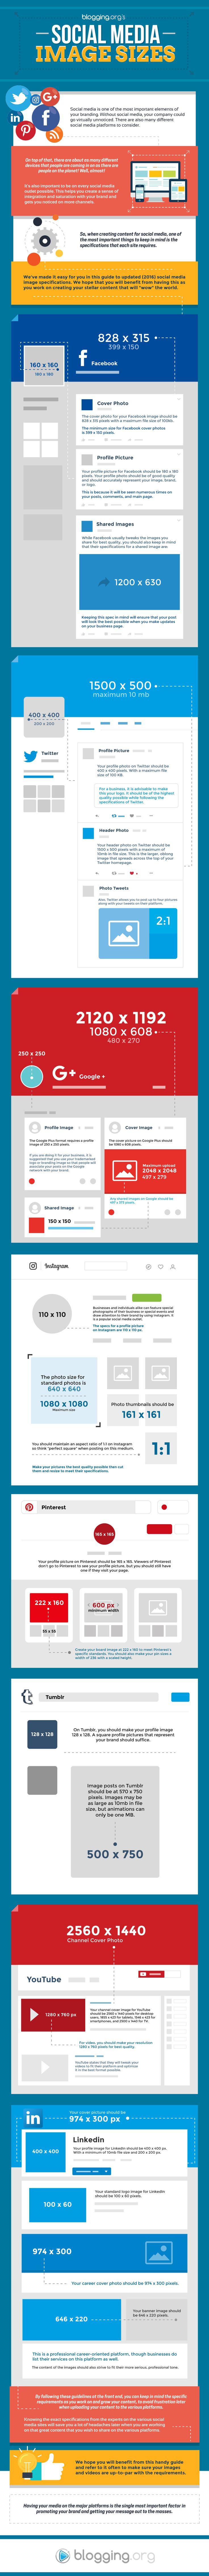 Social #Media Image Size Guide